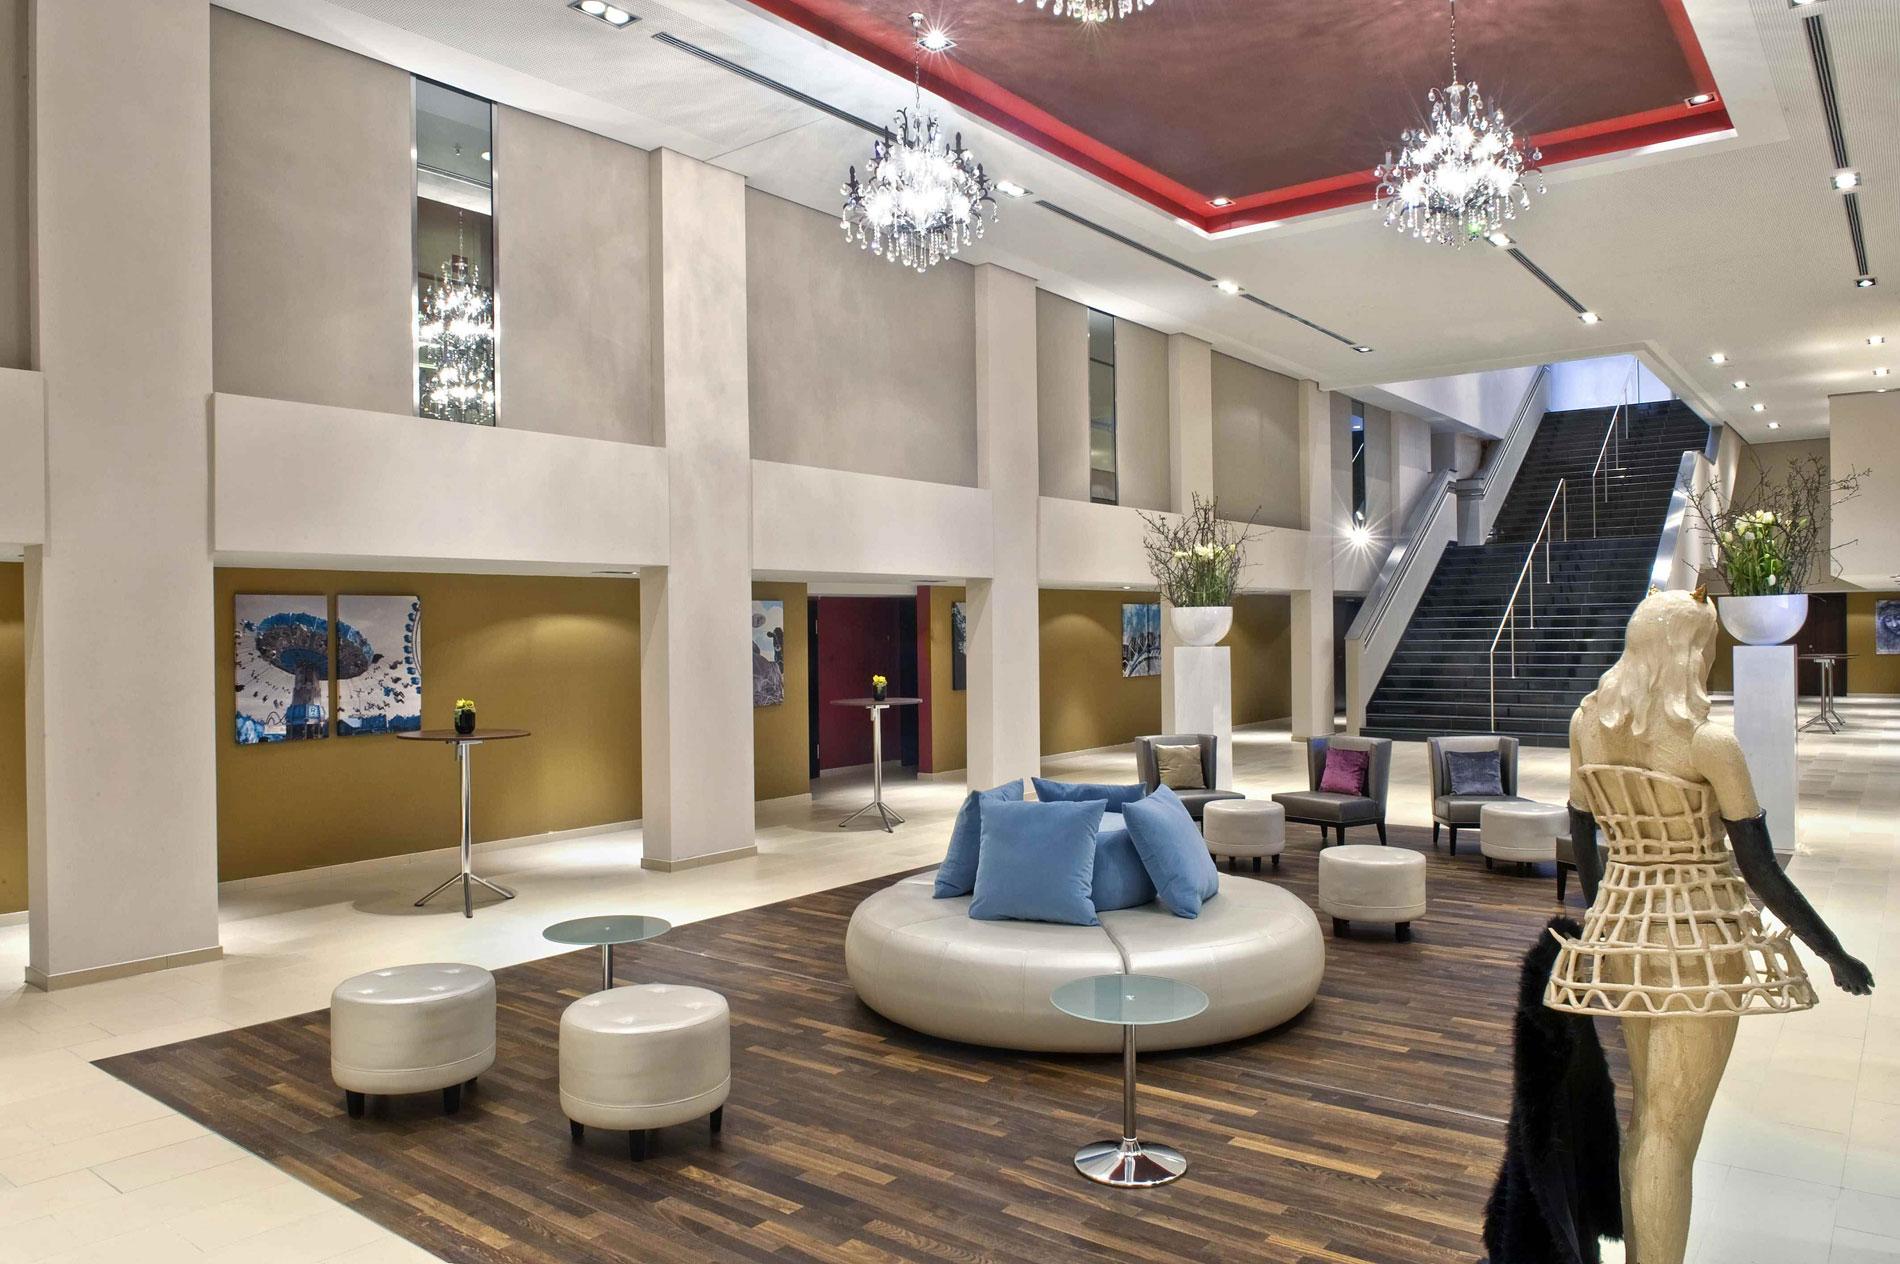 hotelphotography vision-photos hotelfotografie